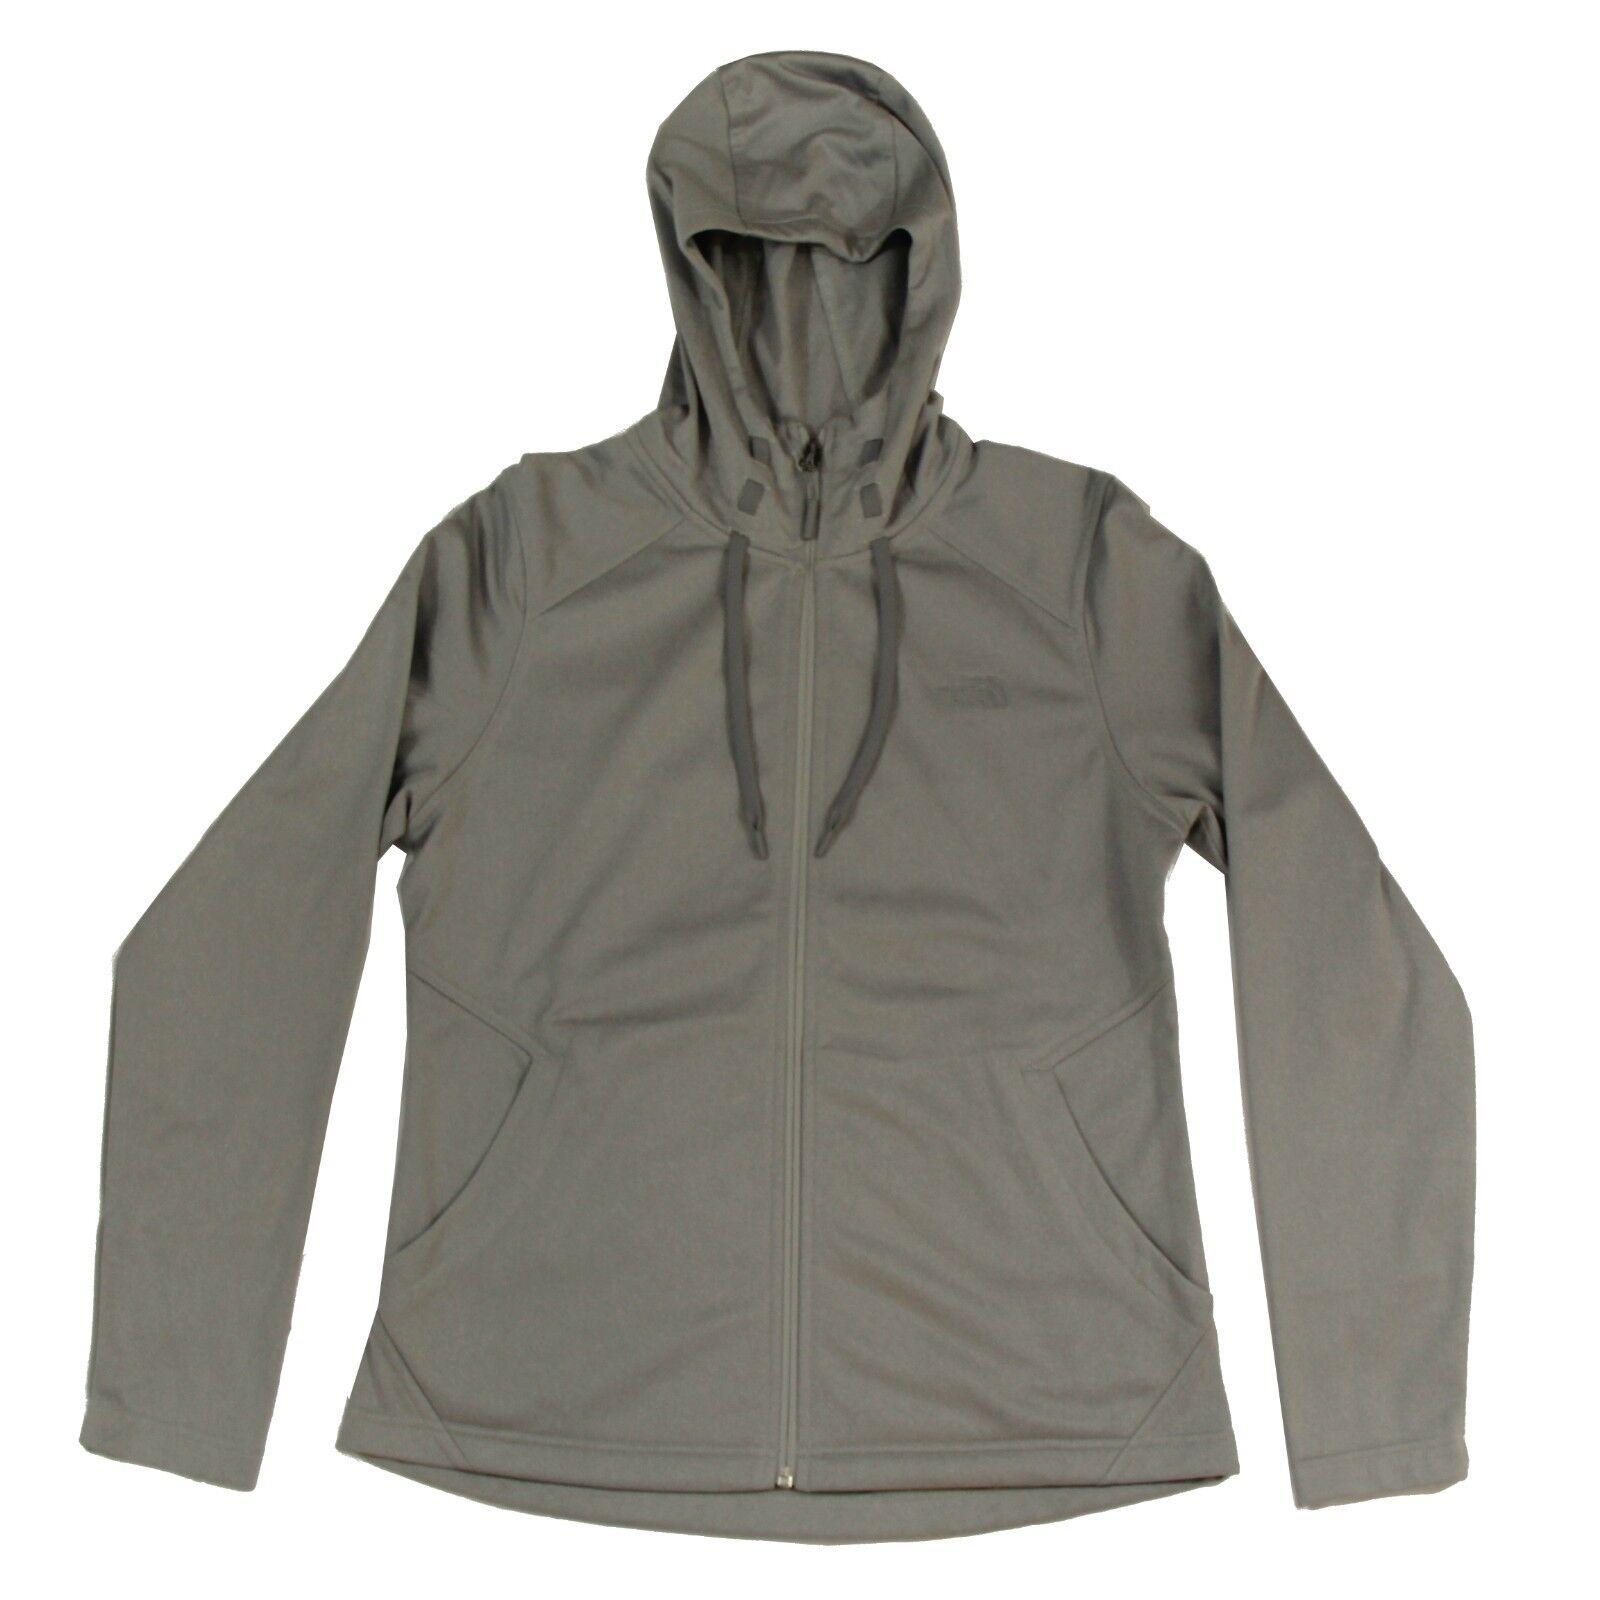 The North Face Women's Tech Tech Tech Mezzaluna Full Zip Hoodie - Size Large L - Slim Fit a7f906